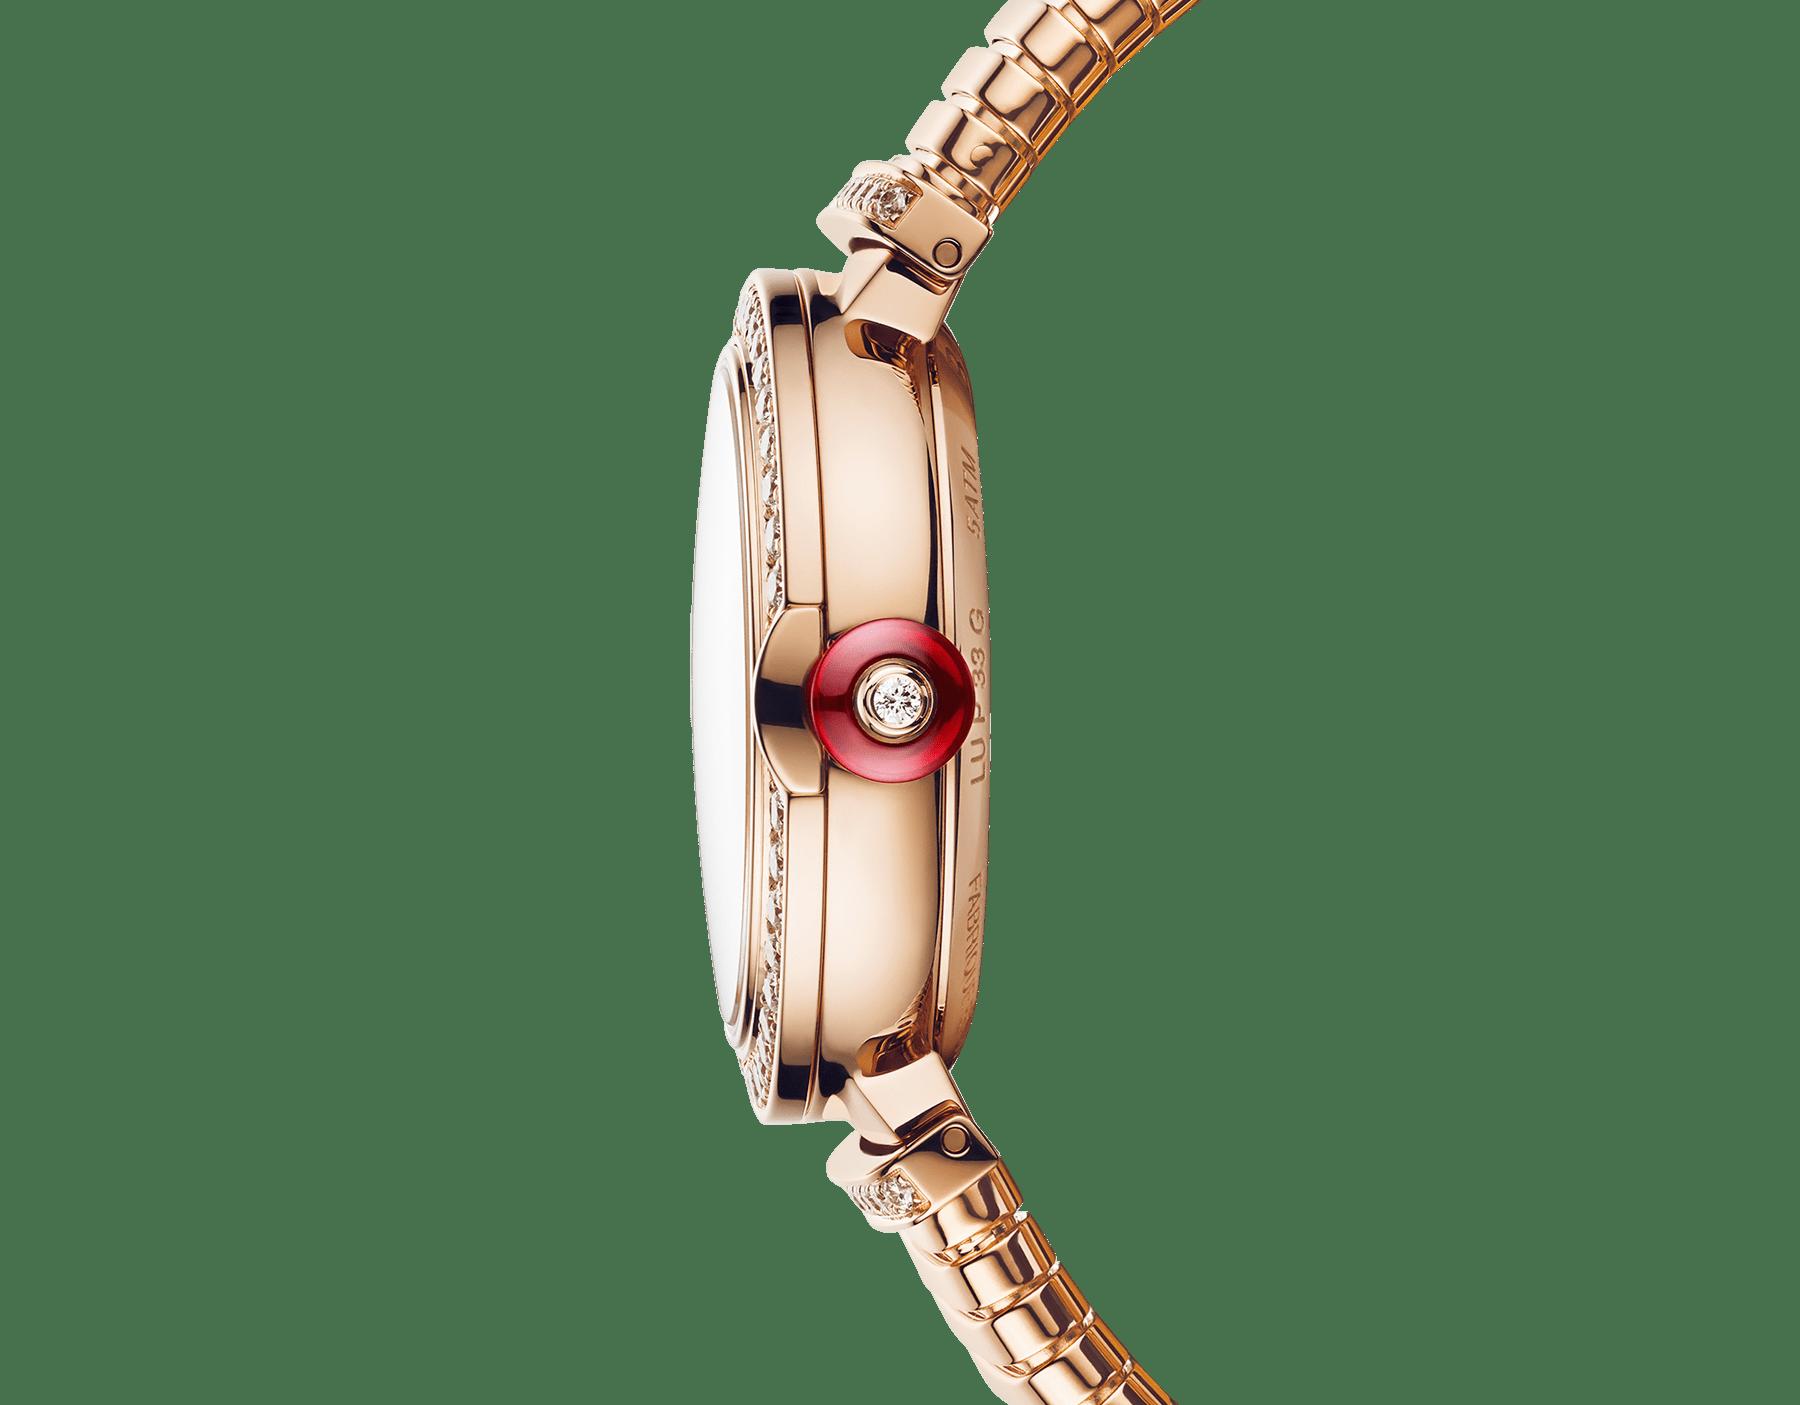 Reloj LVCEA Tubogas con caja en oro rosa de 18qt con diamantes engastados, esfera de madreperla blanca, diamantes engastados como índices y brazalete tubogas en oro rosa de 18qt. 103034 image 3